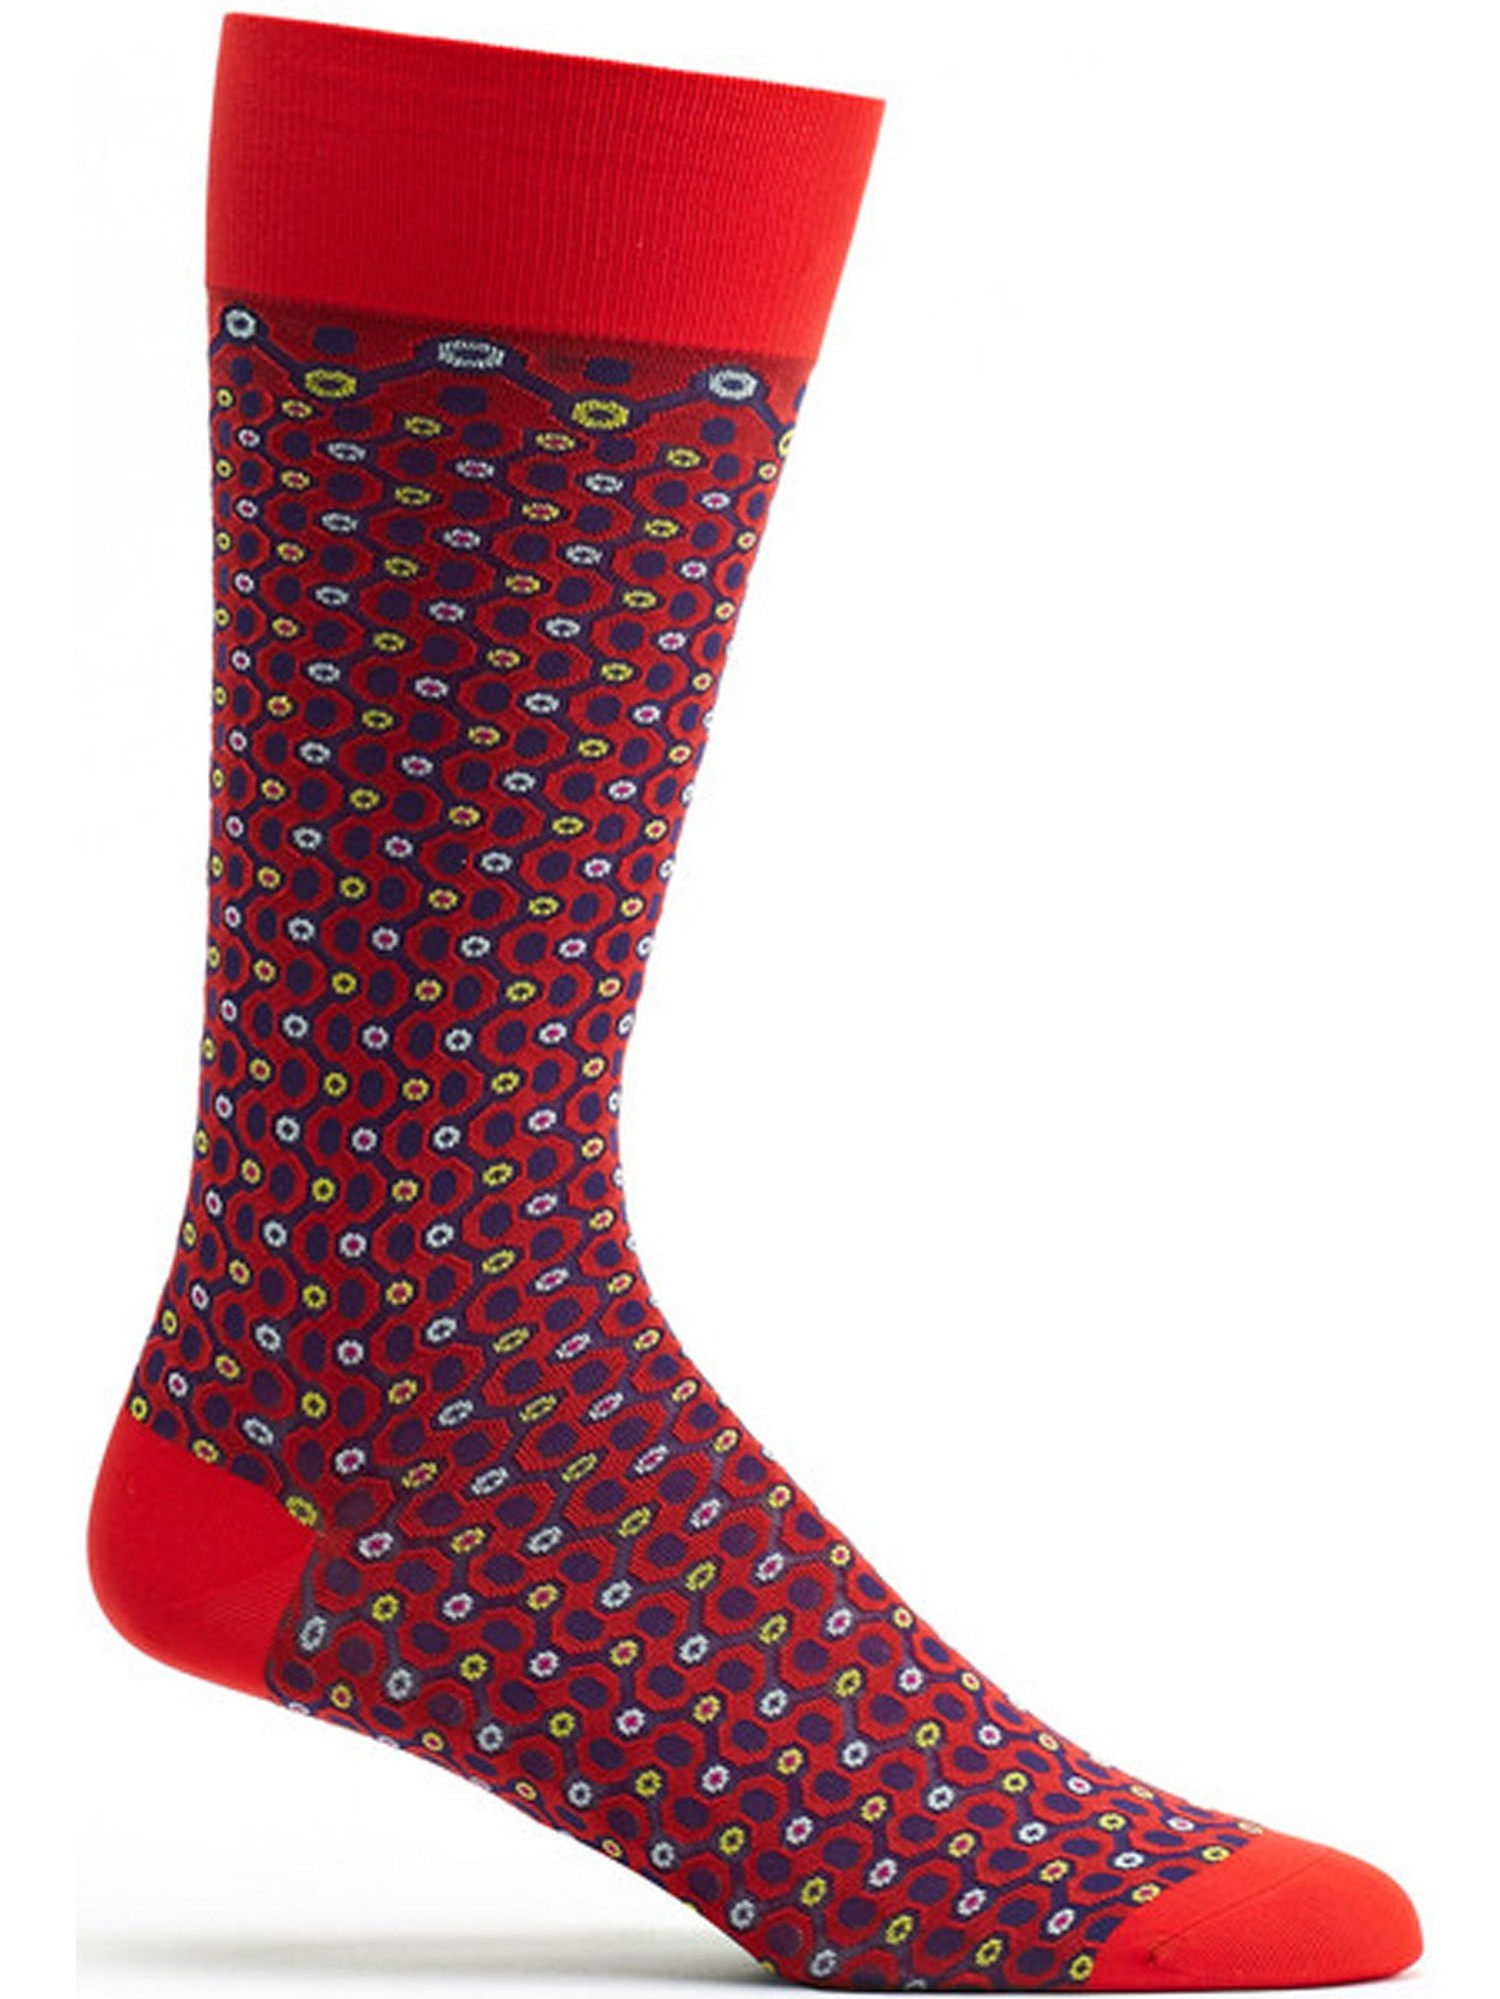 Ozone Socks - Mens Crescent Waves Sock - Red